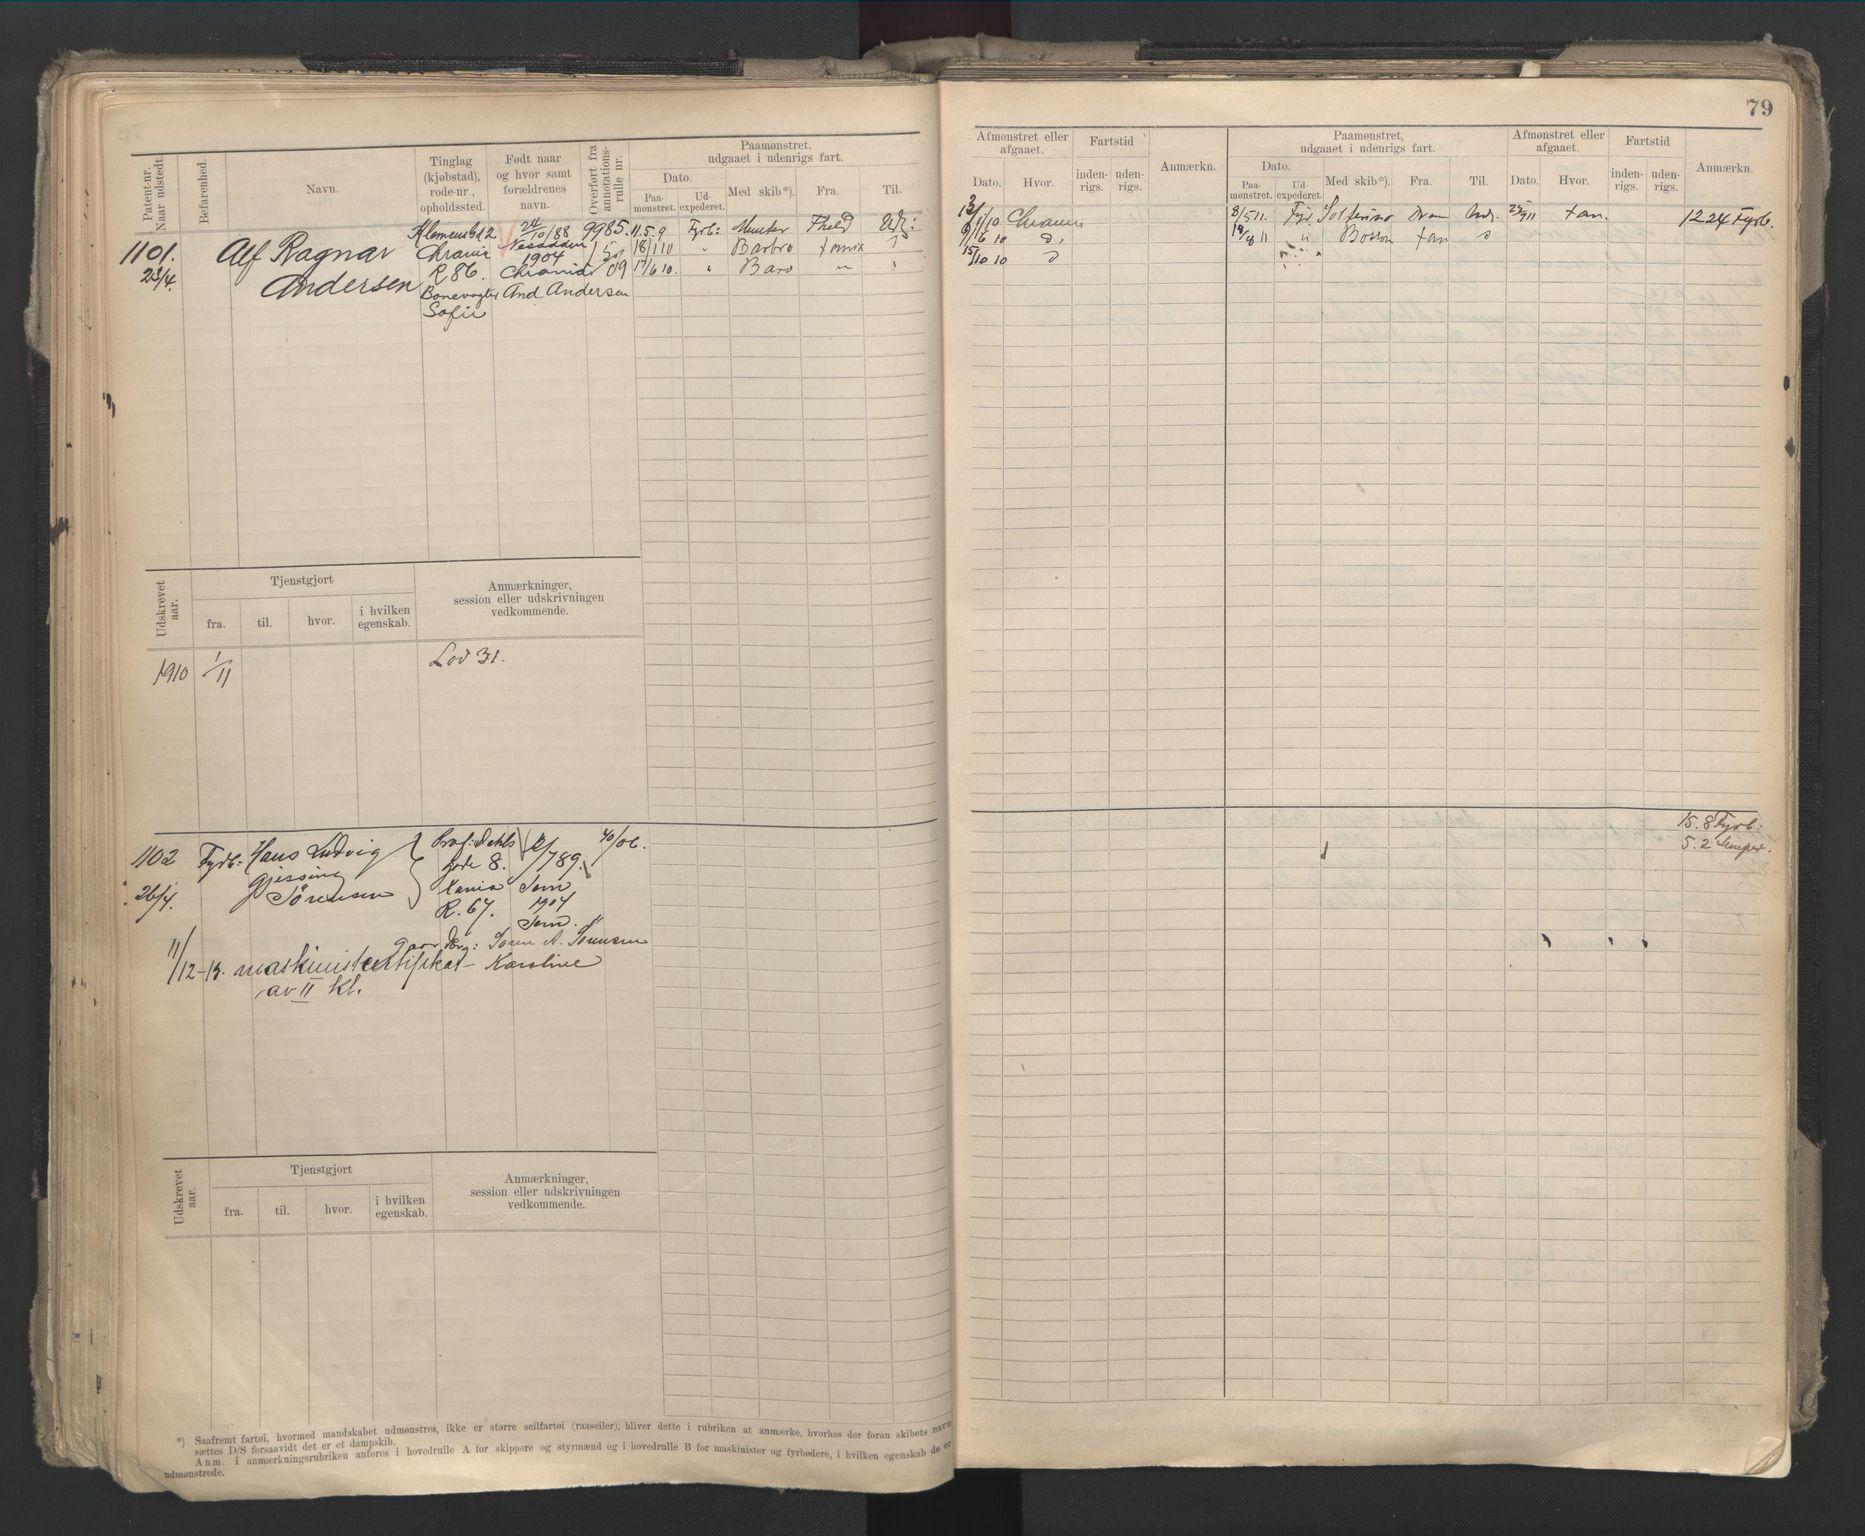 SAO, Oslo sjømannskontor, F/Fd/L0002: B-rulle, 1906-1916, s. 78b-79a